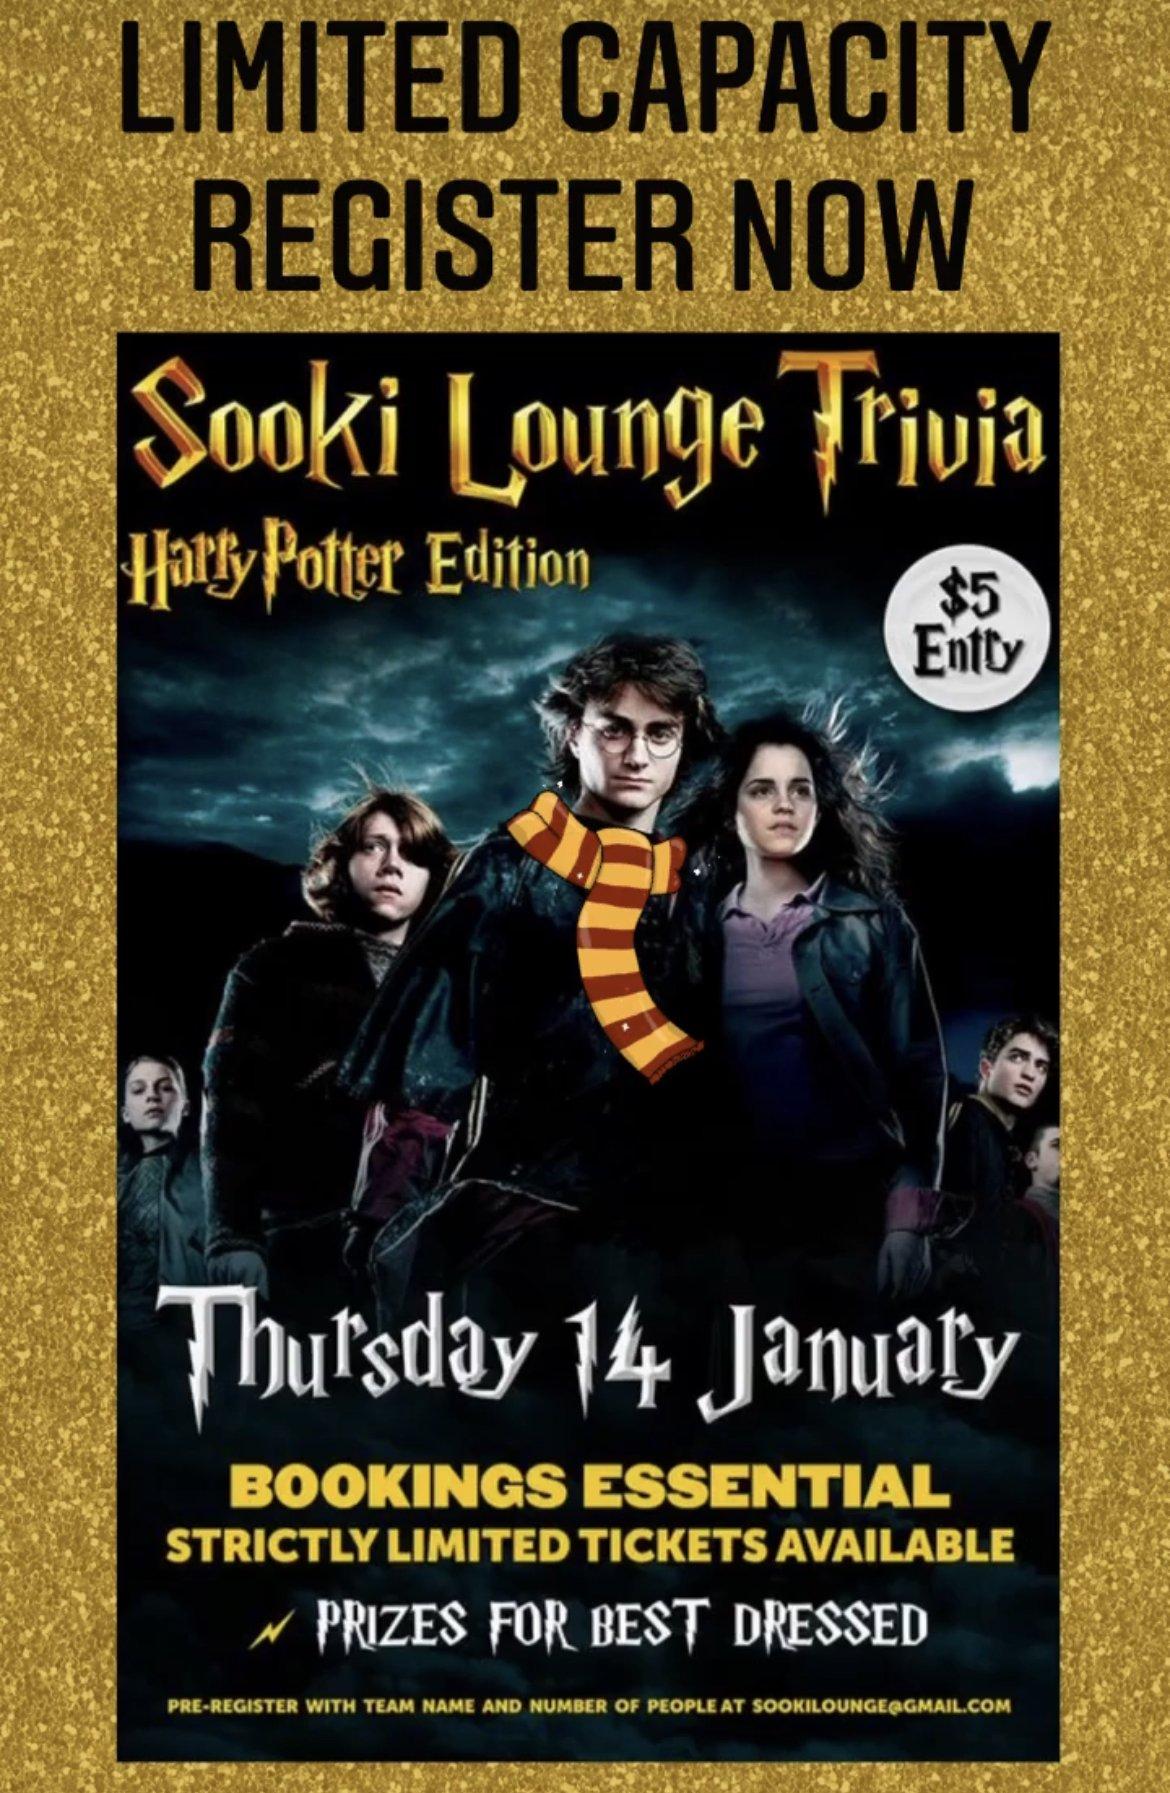 harry-potter-trivia-sooki-lounge-belgrave